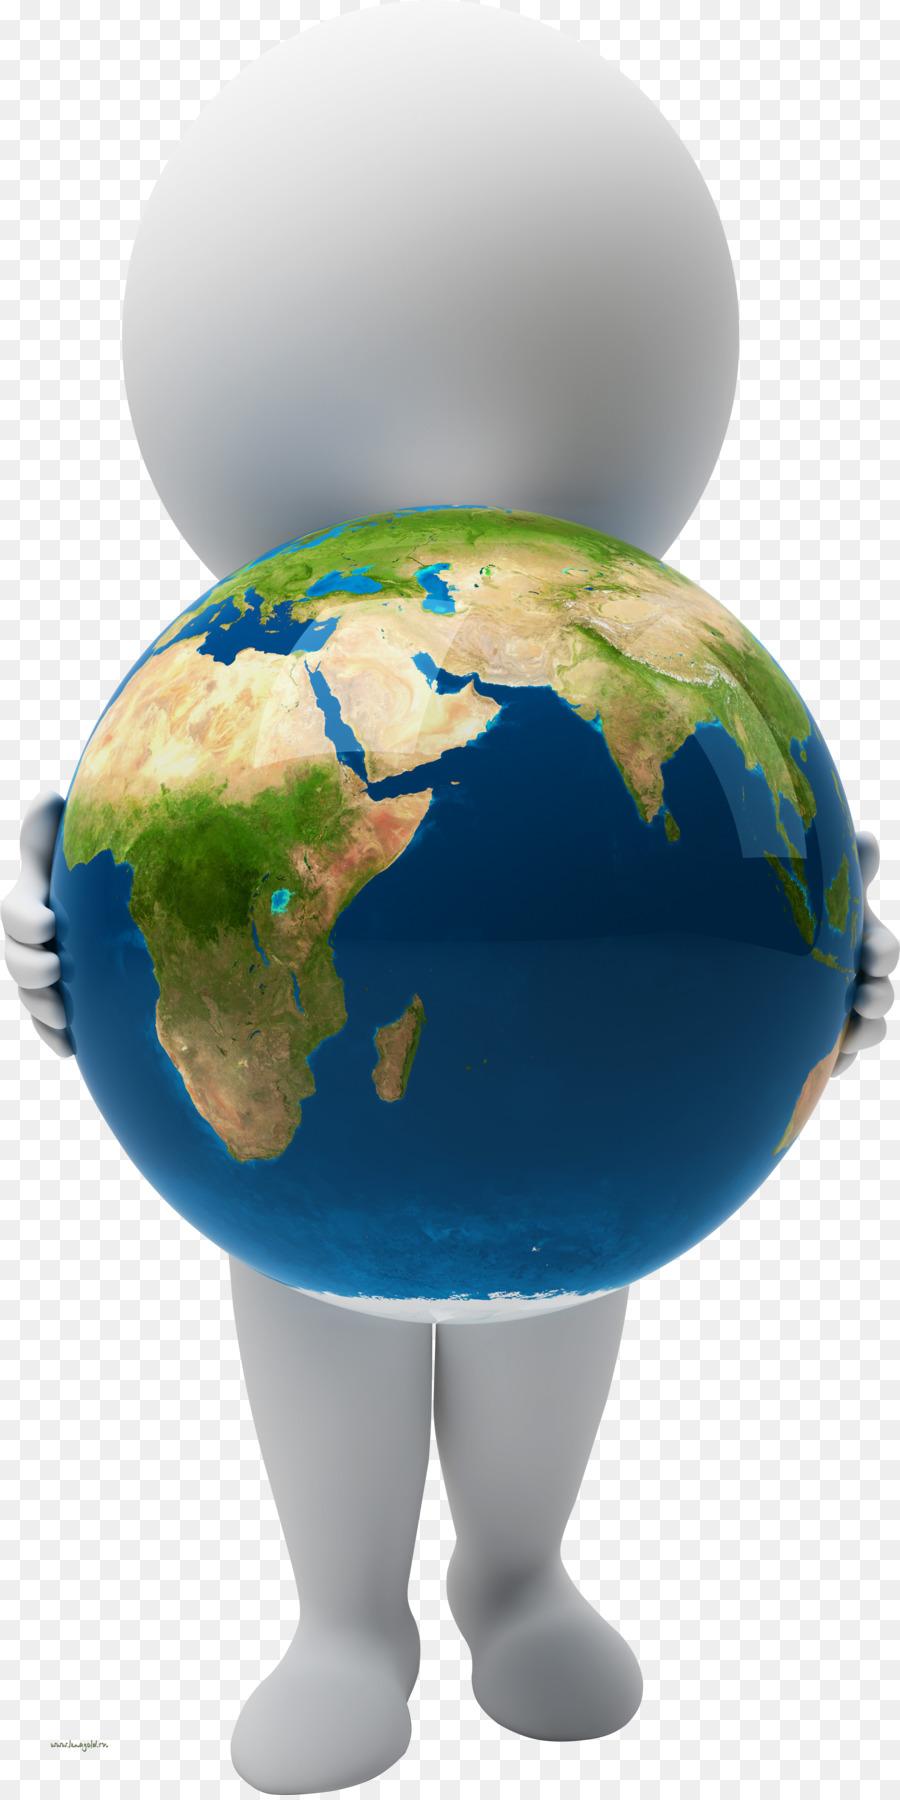 Картинка глобус человек